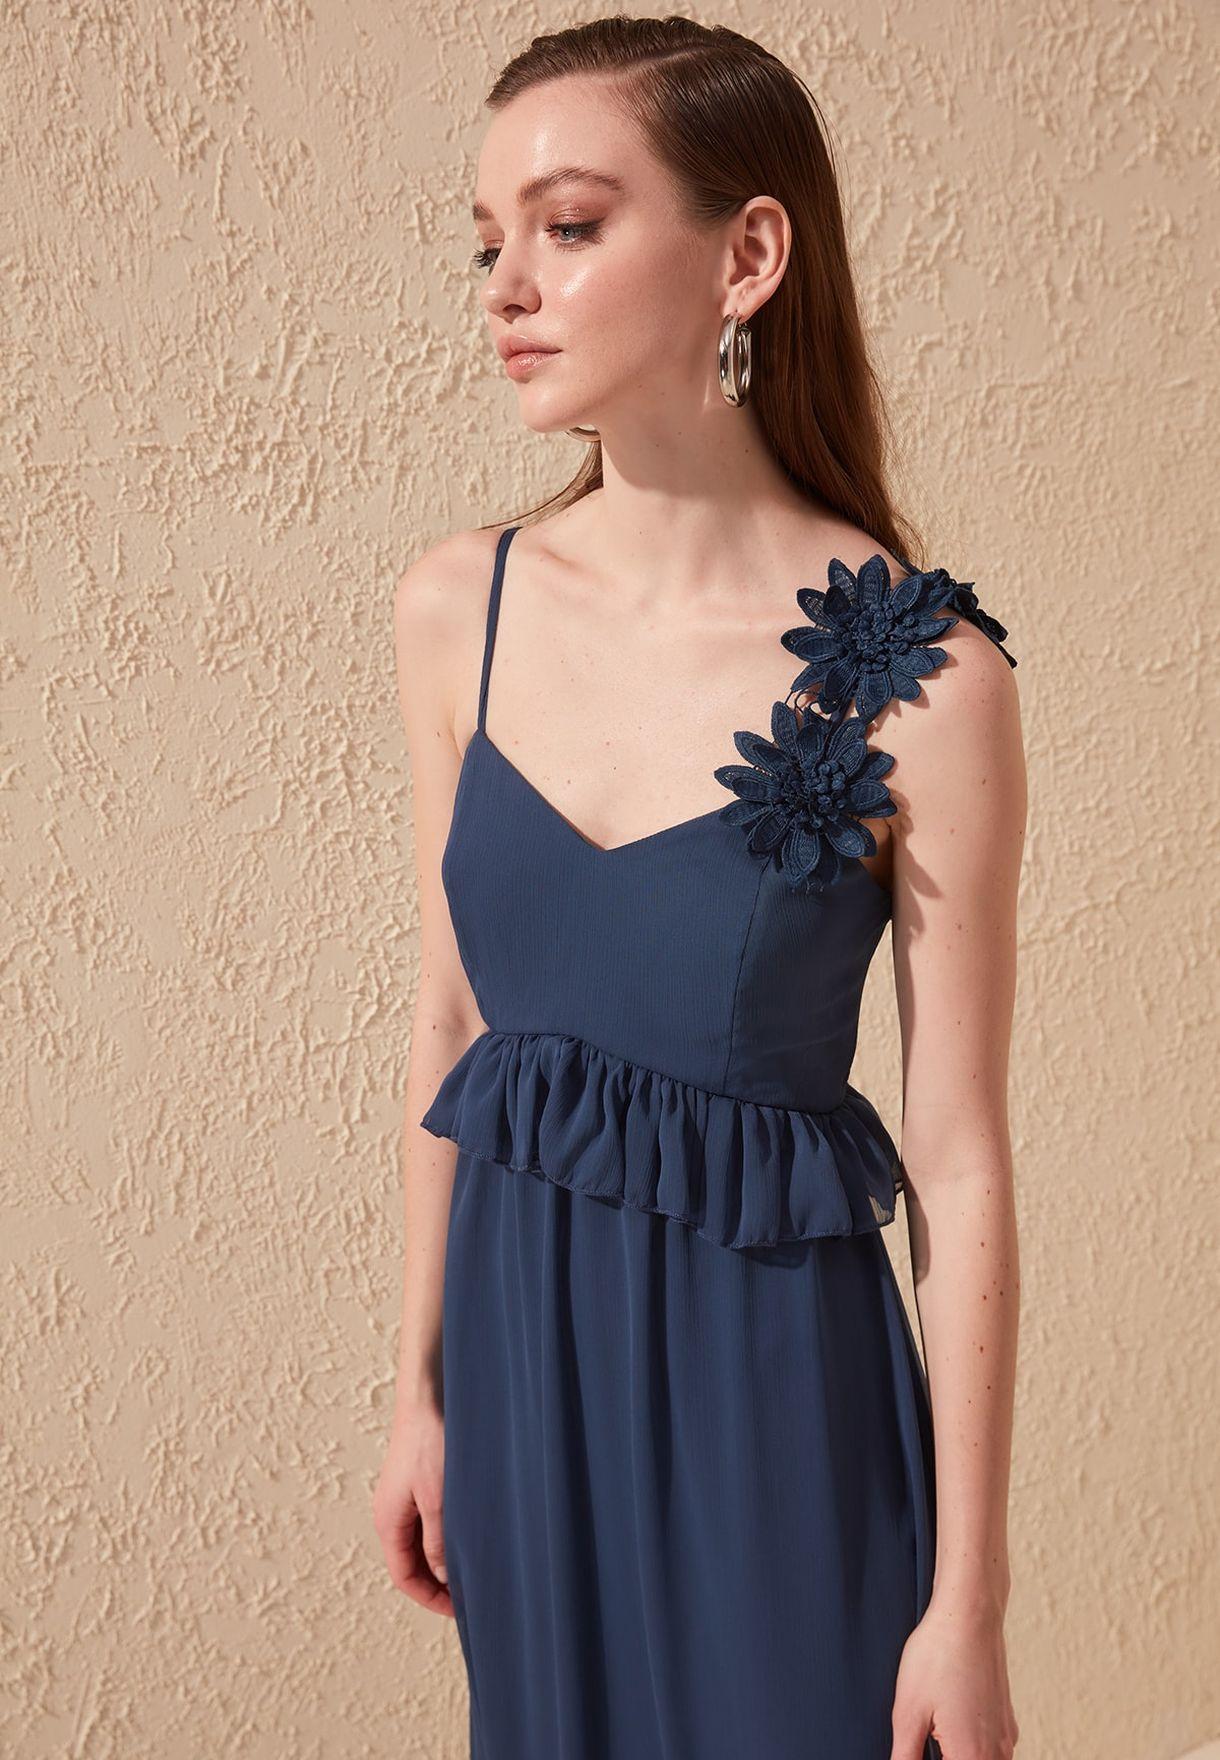 Floral Detail Cami Strap Dress